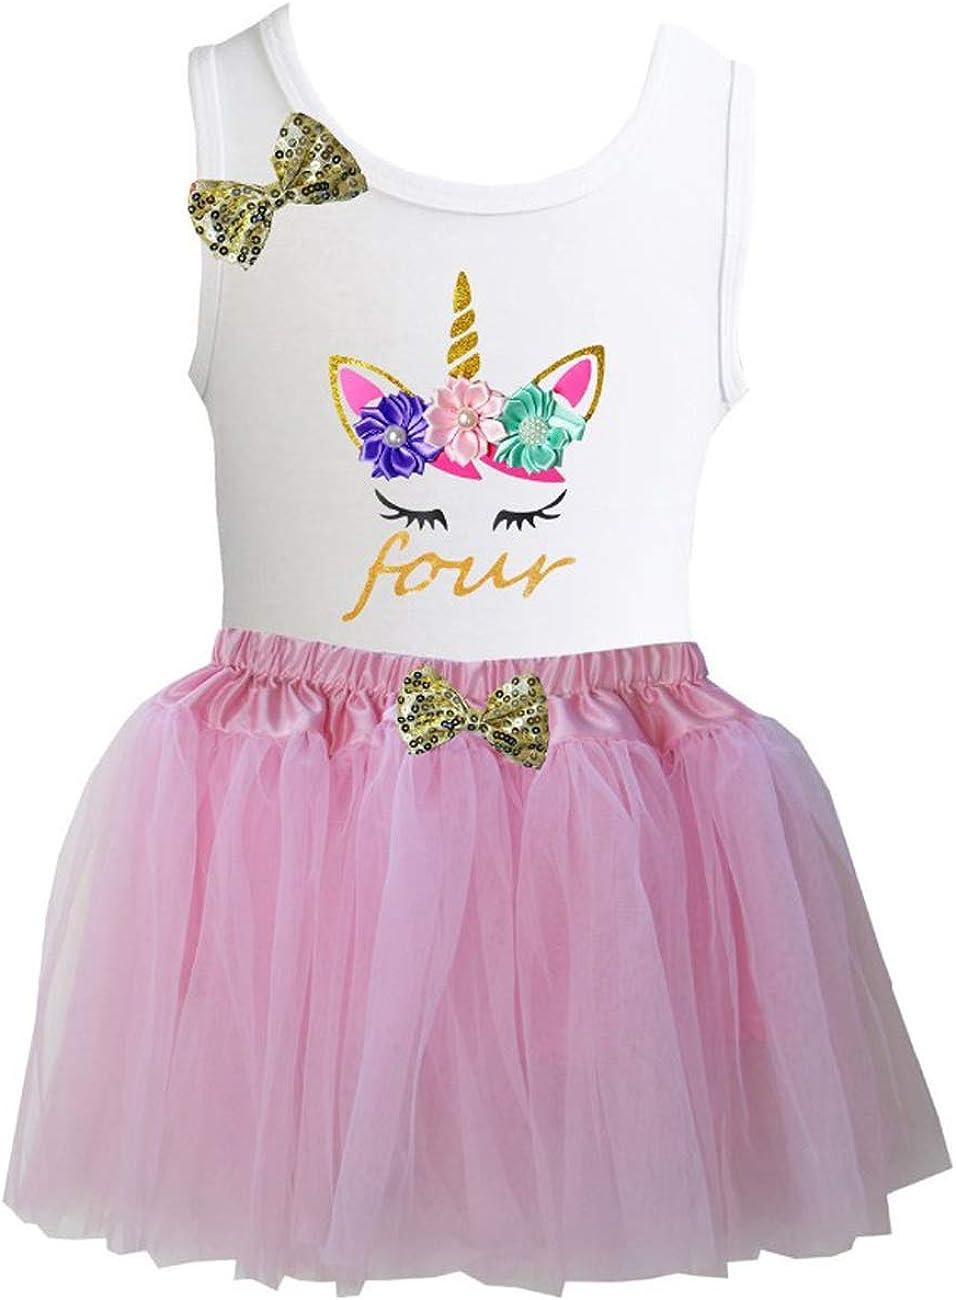 Kirei Sui Girls Light Pink Tulle Tutu /& Tee 1st-5th Birthday Unicorn Outfit